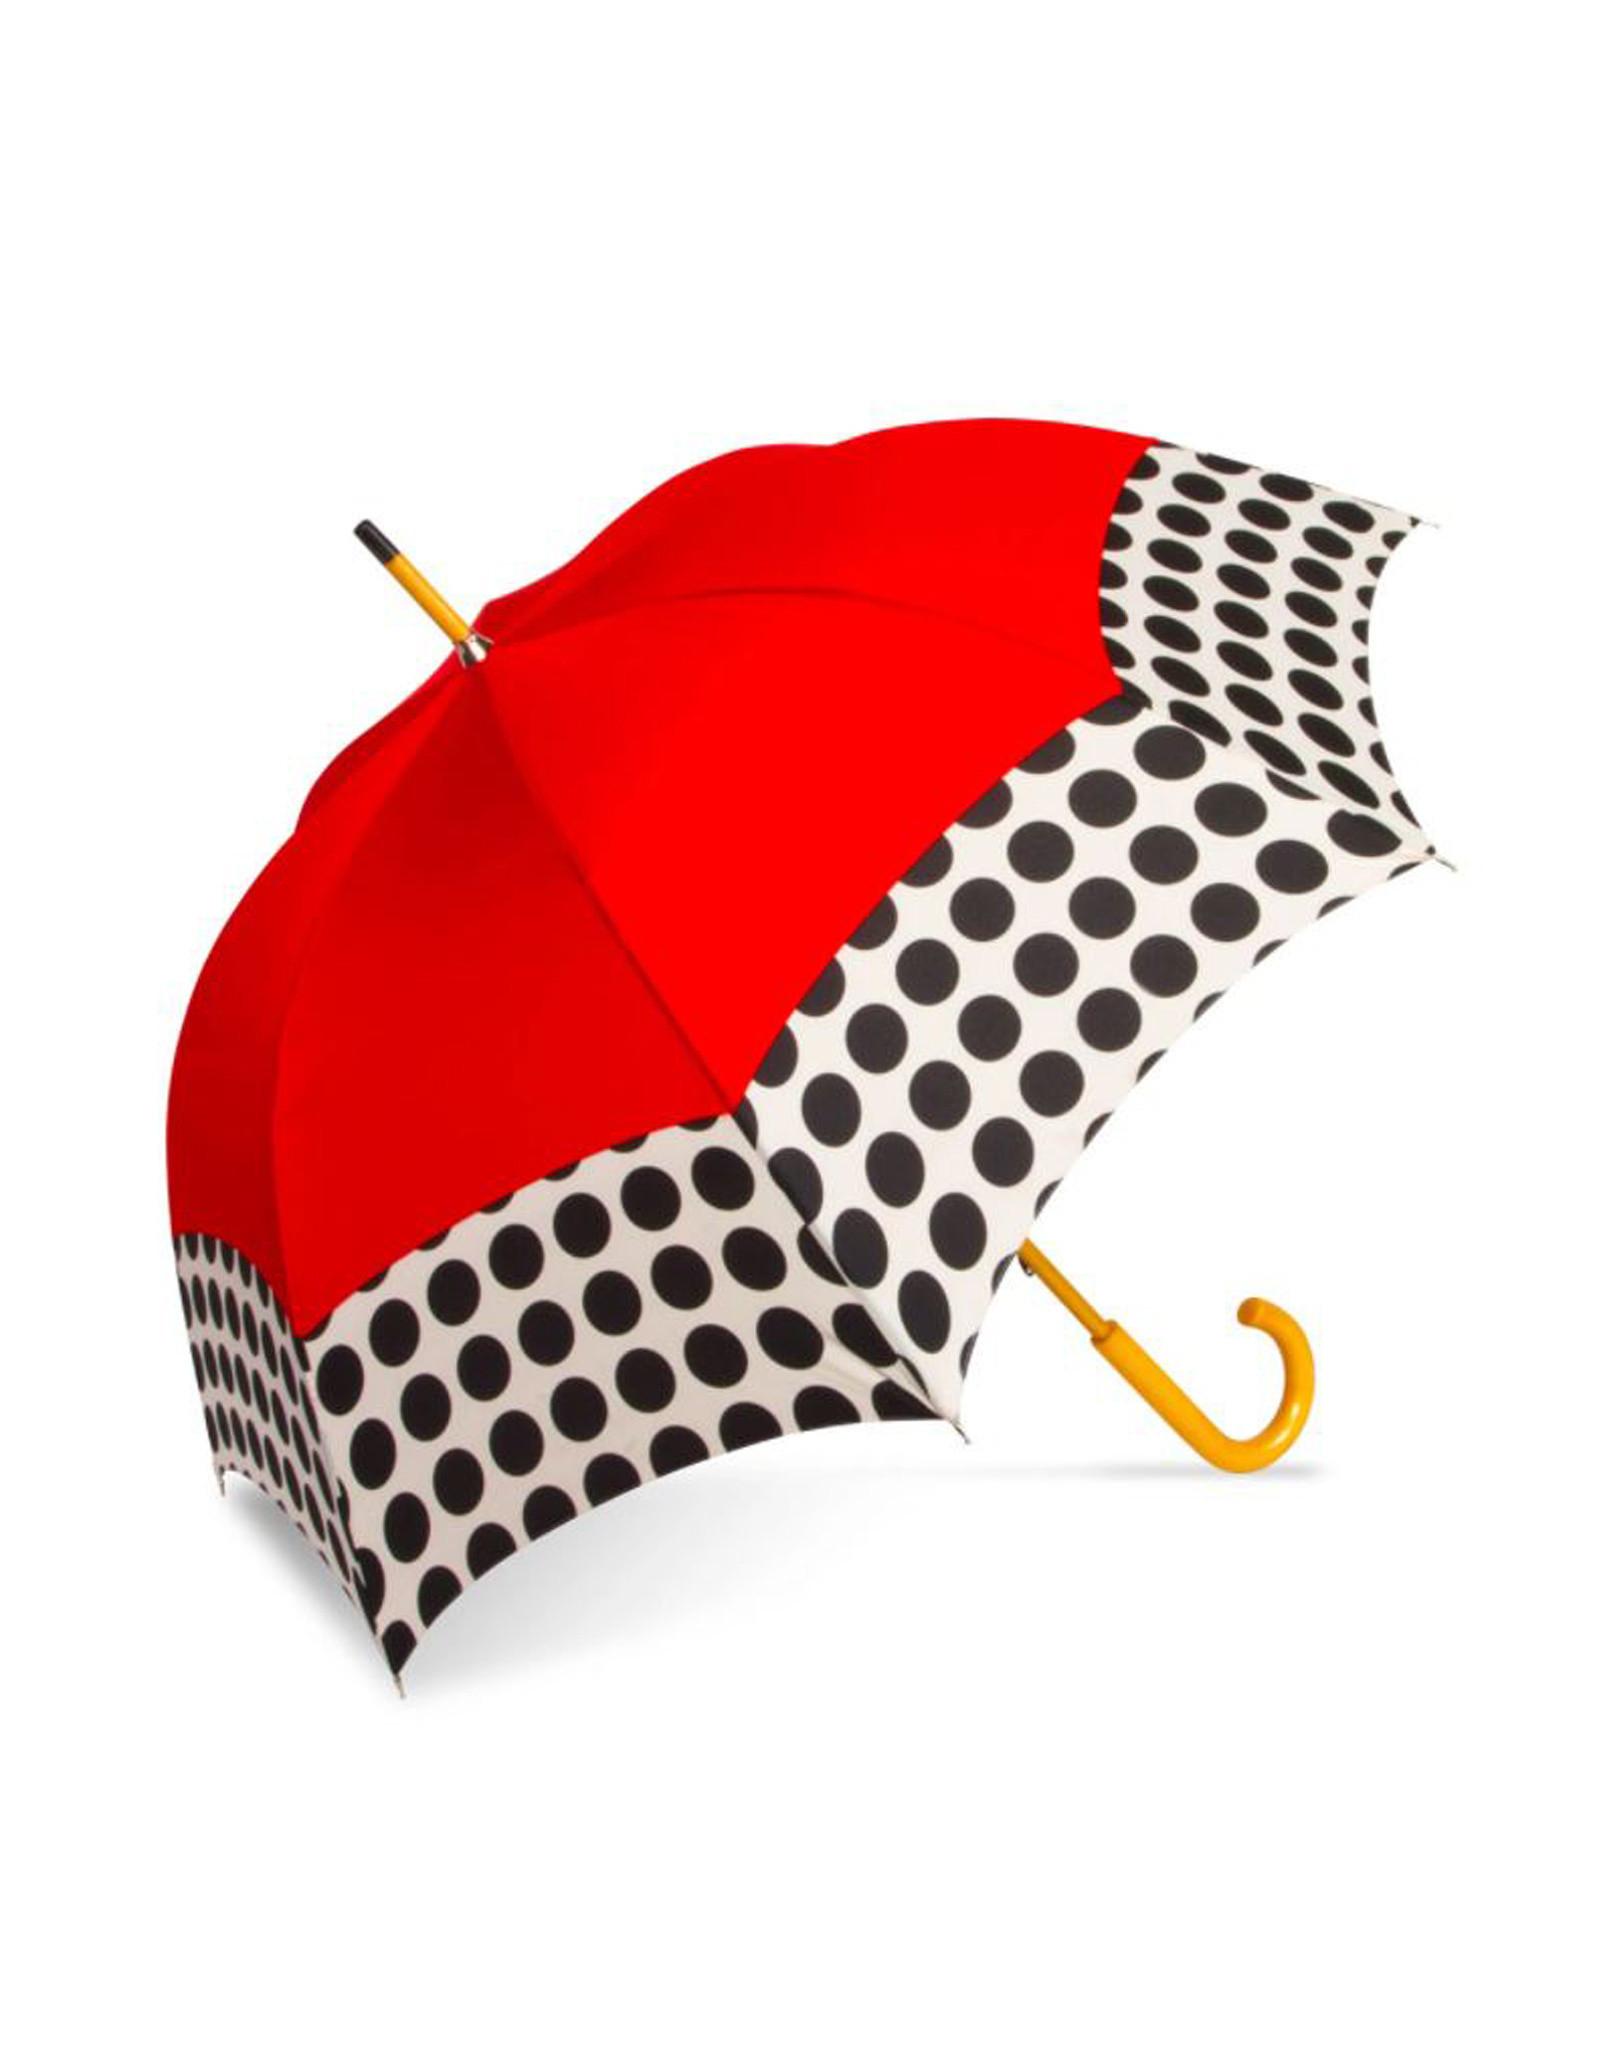 Red and Black Polka Dot Umbrella